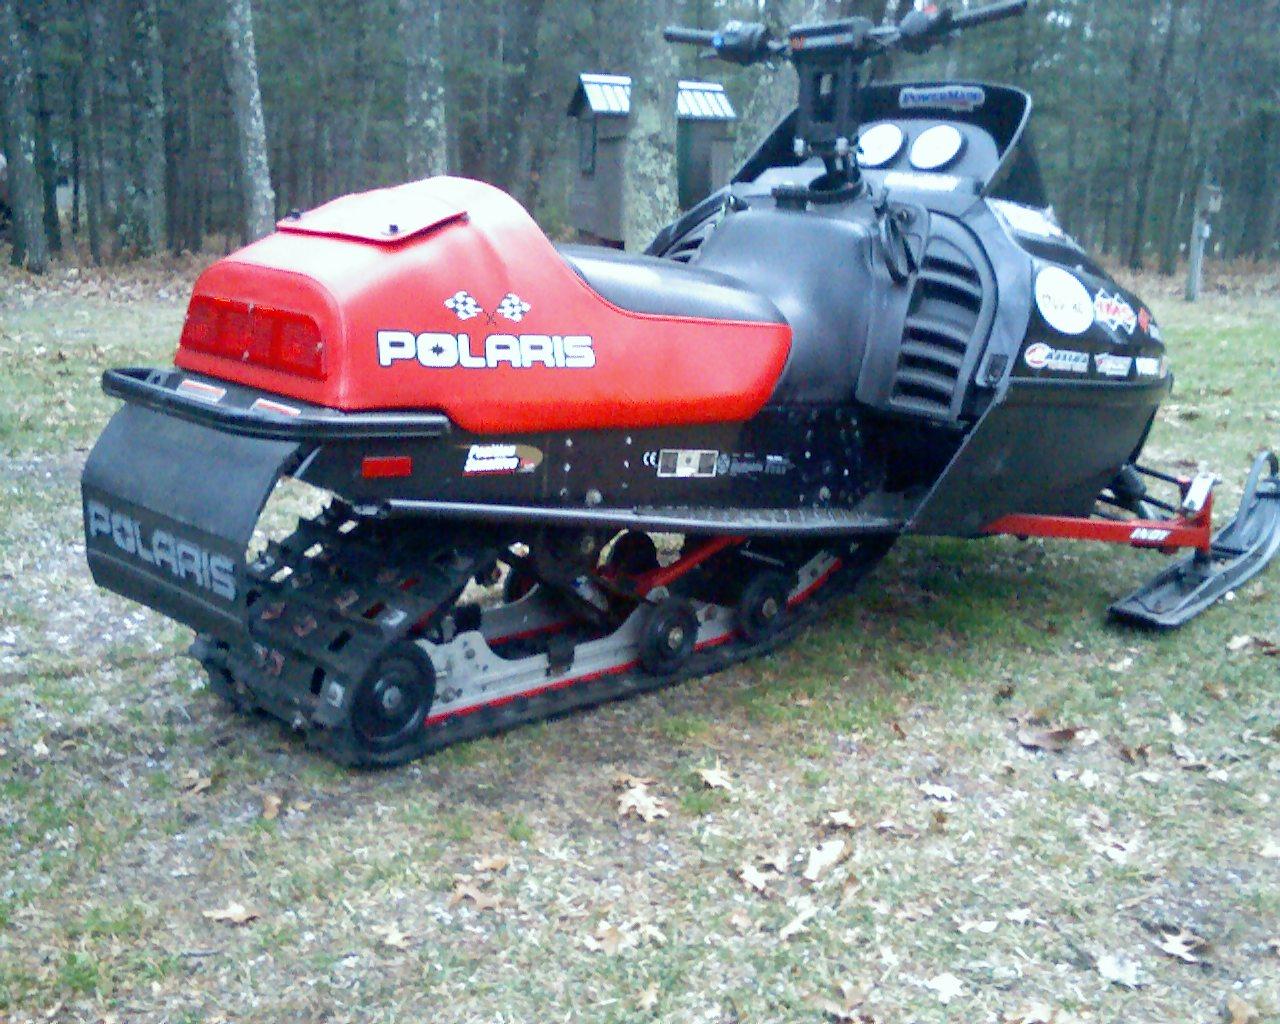 2000 Polaris 500 Xc Sp Mod Extras